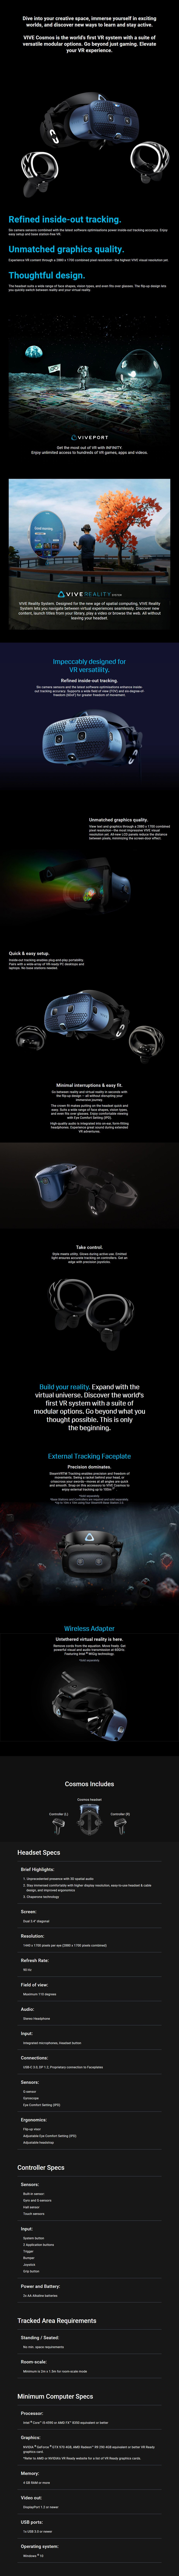 htc_vive_cosmos_virtual_reality_kit_with_link_box_ac39532.jpg